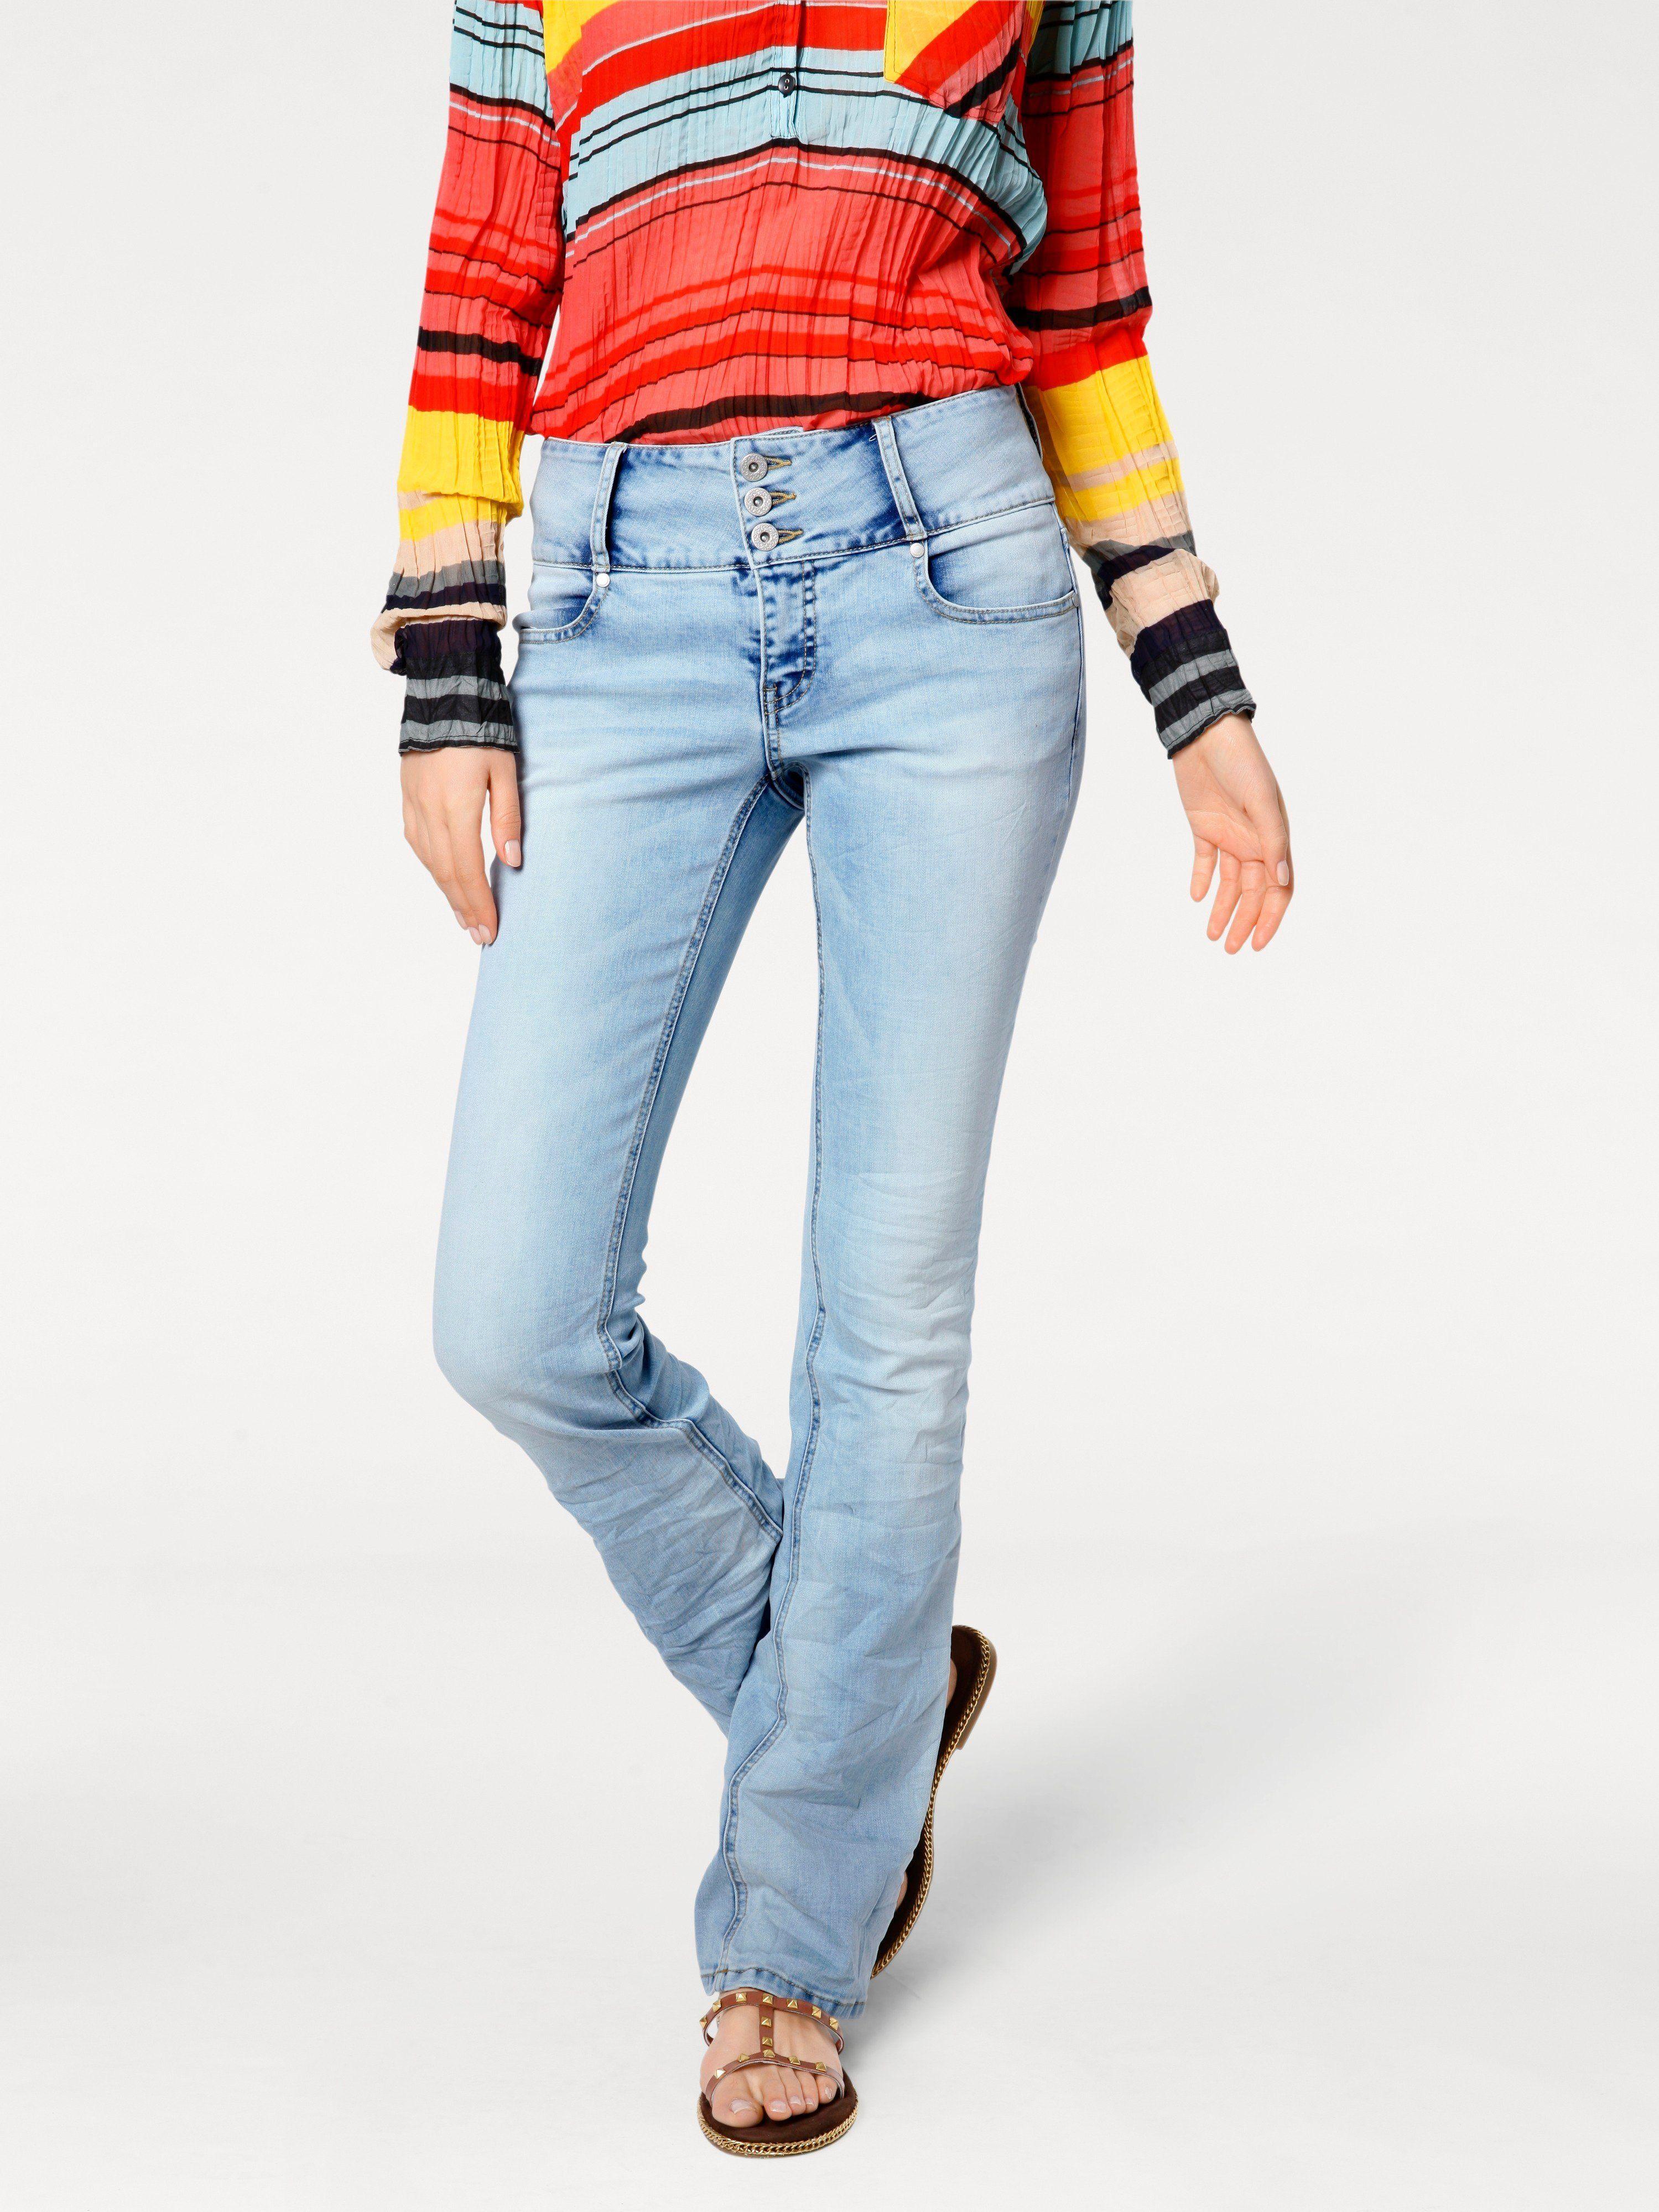 3df70973042  Damen B.C. BEST CONNECTIONS by Heine Flared-Jeans in Crash-Optik blau